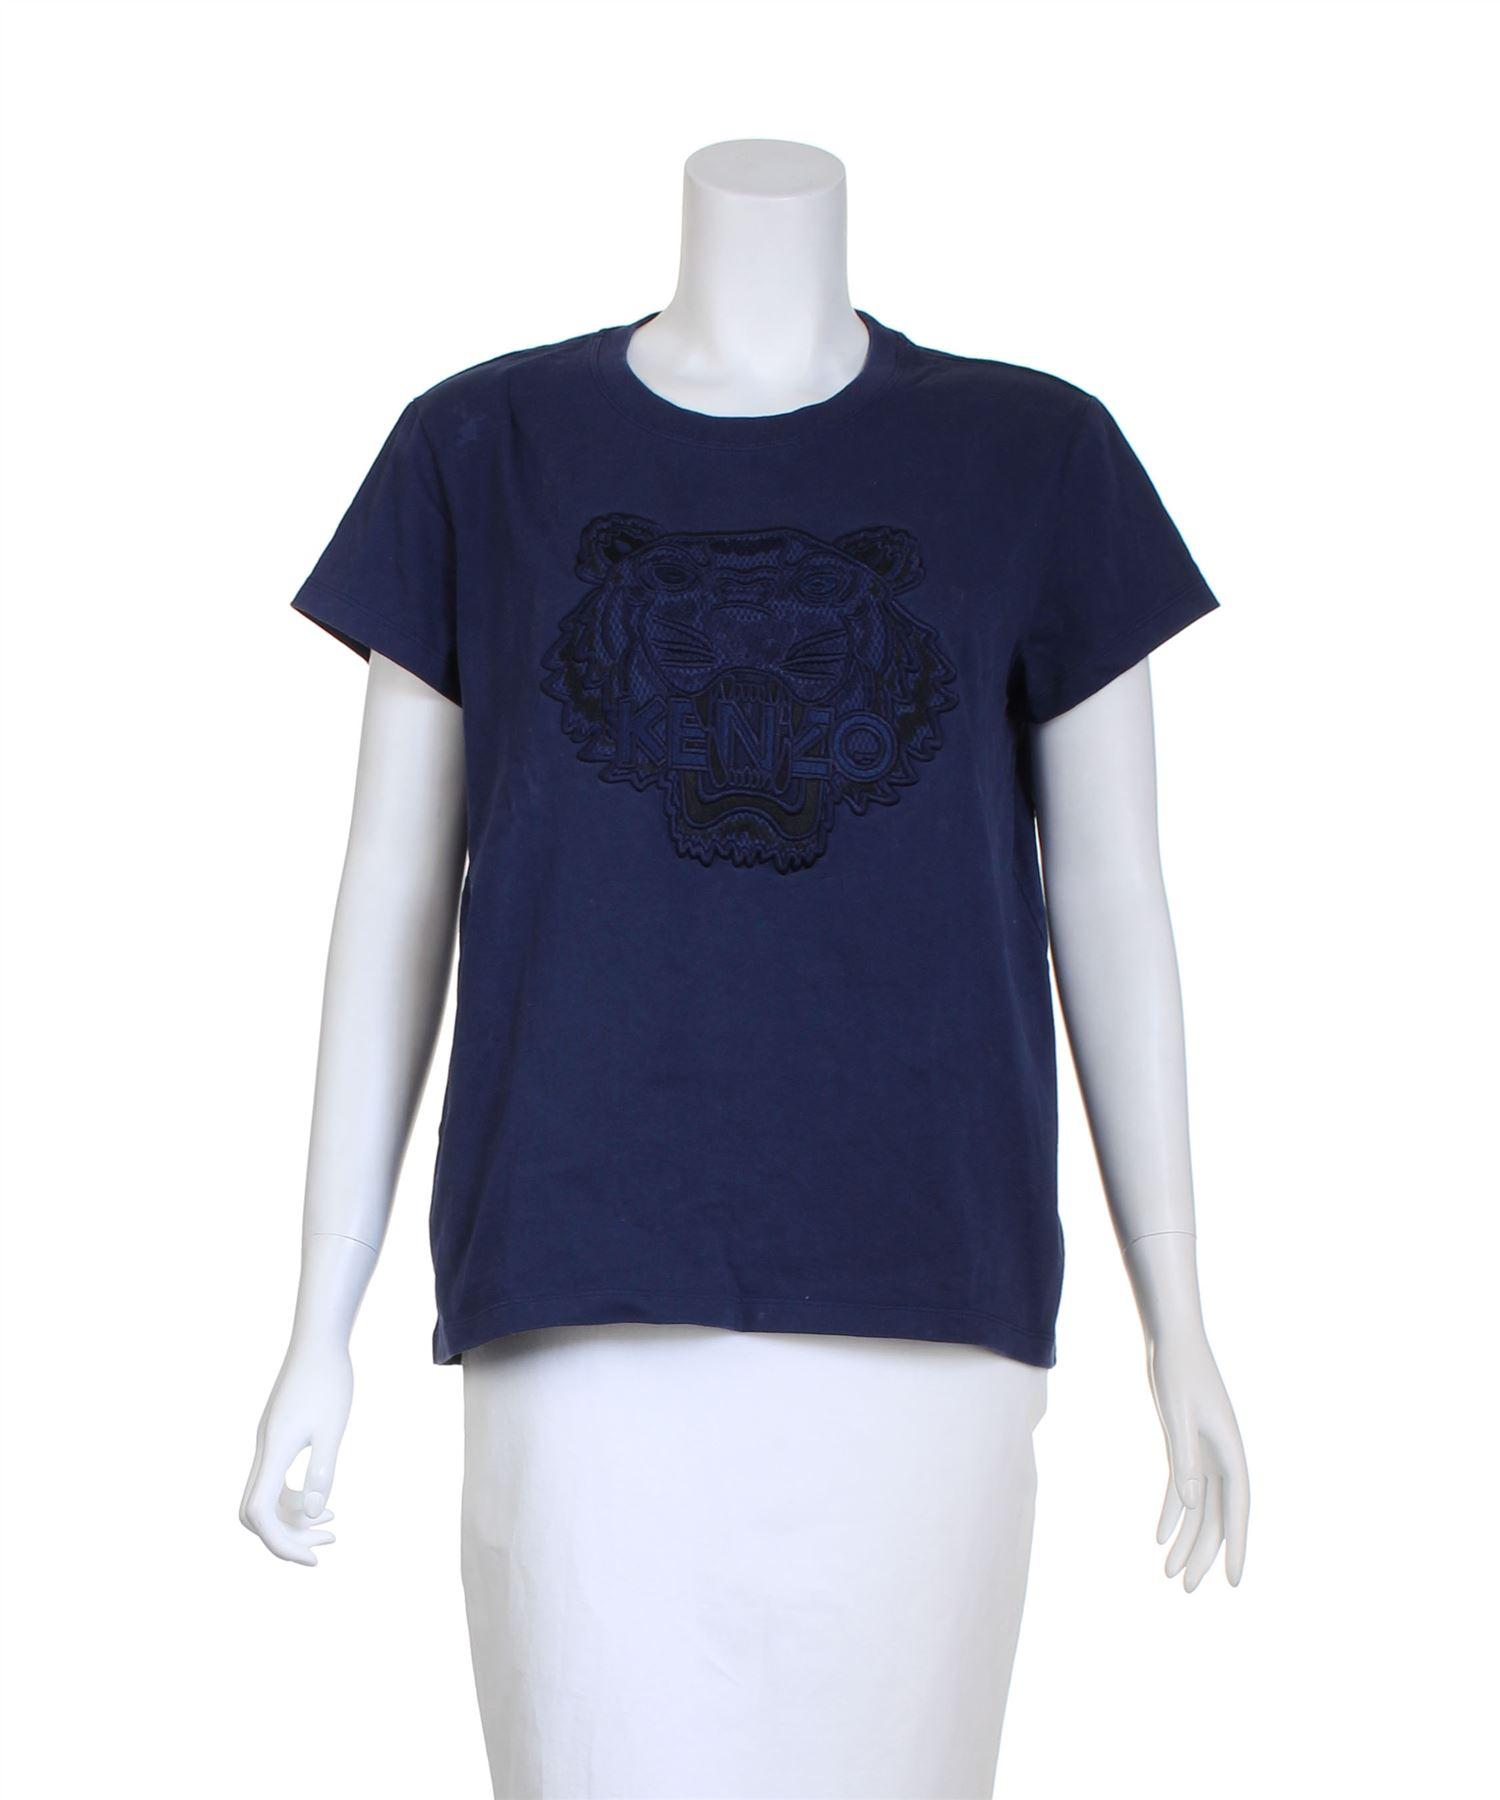 b8d5948f2efd KENZO Tiger Navy Blue Cotton T-Shirt, Size M   eBay